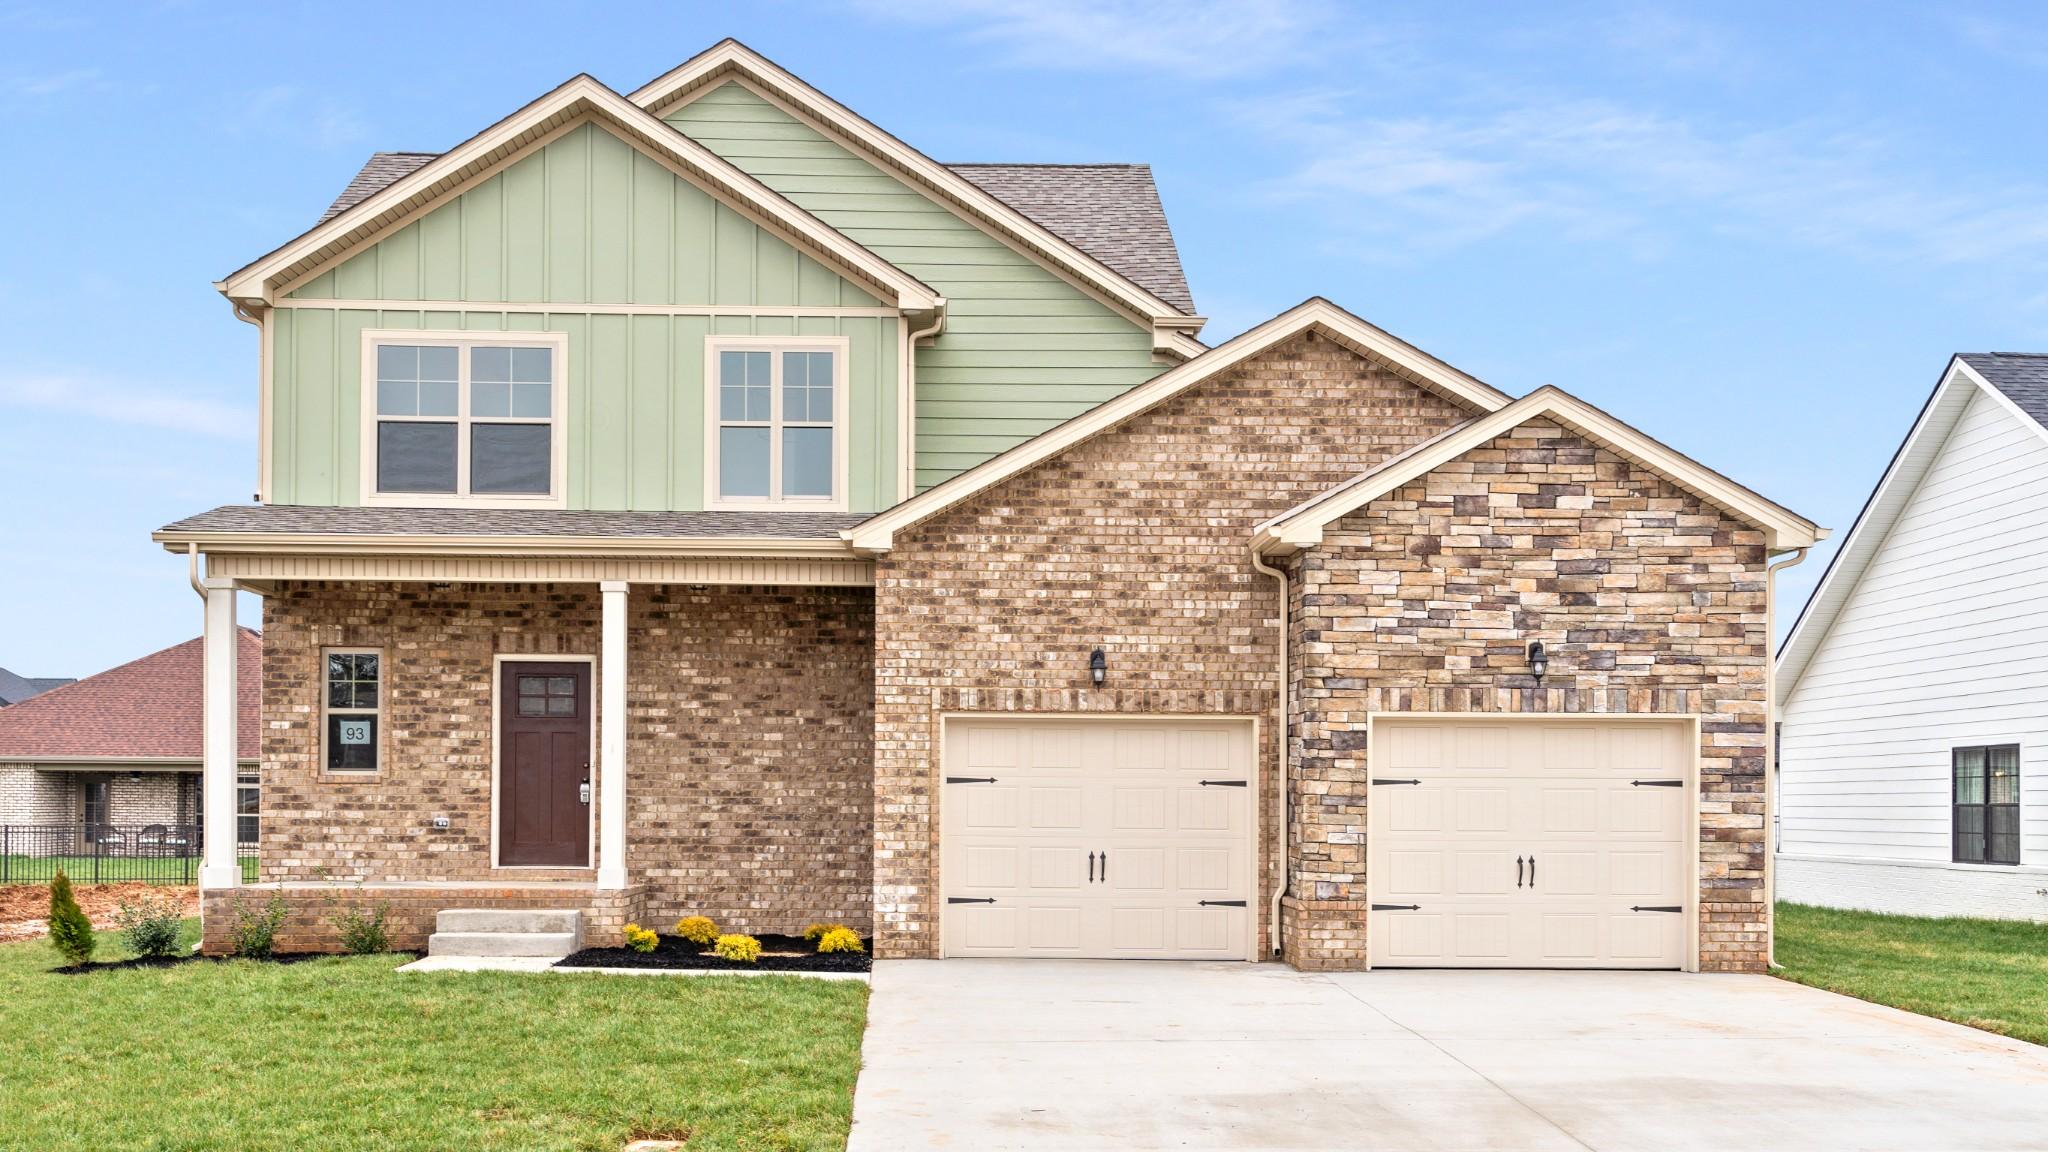 525 Dexter Drive, Clarksville, TN 37043 - Clarksville, TN real estate listing